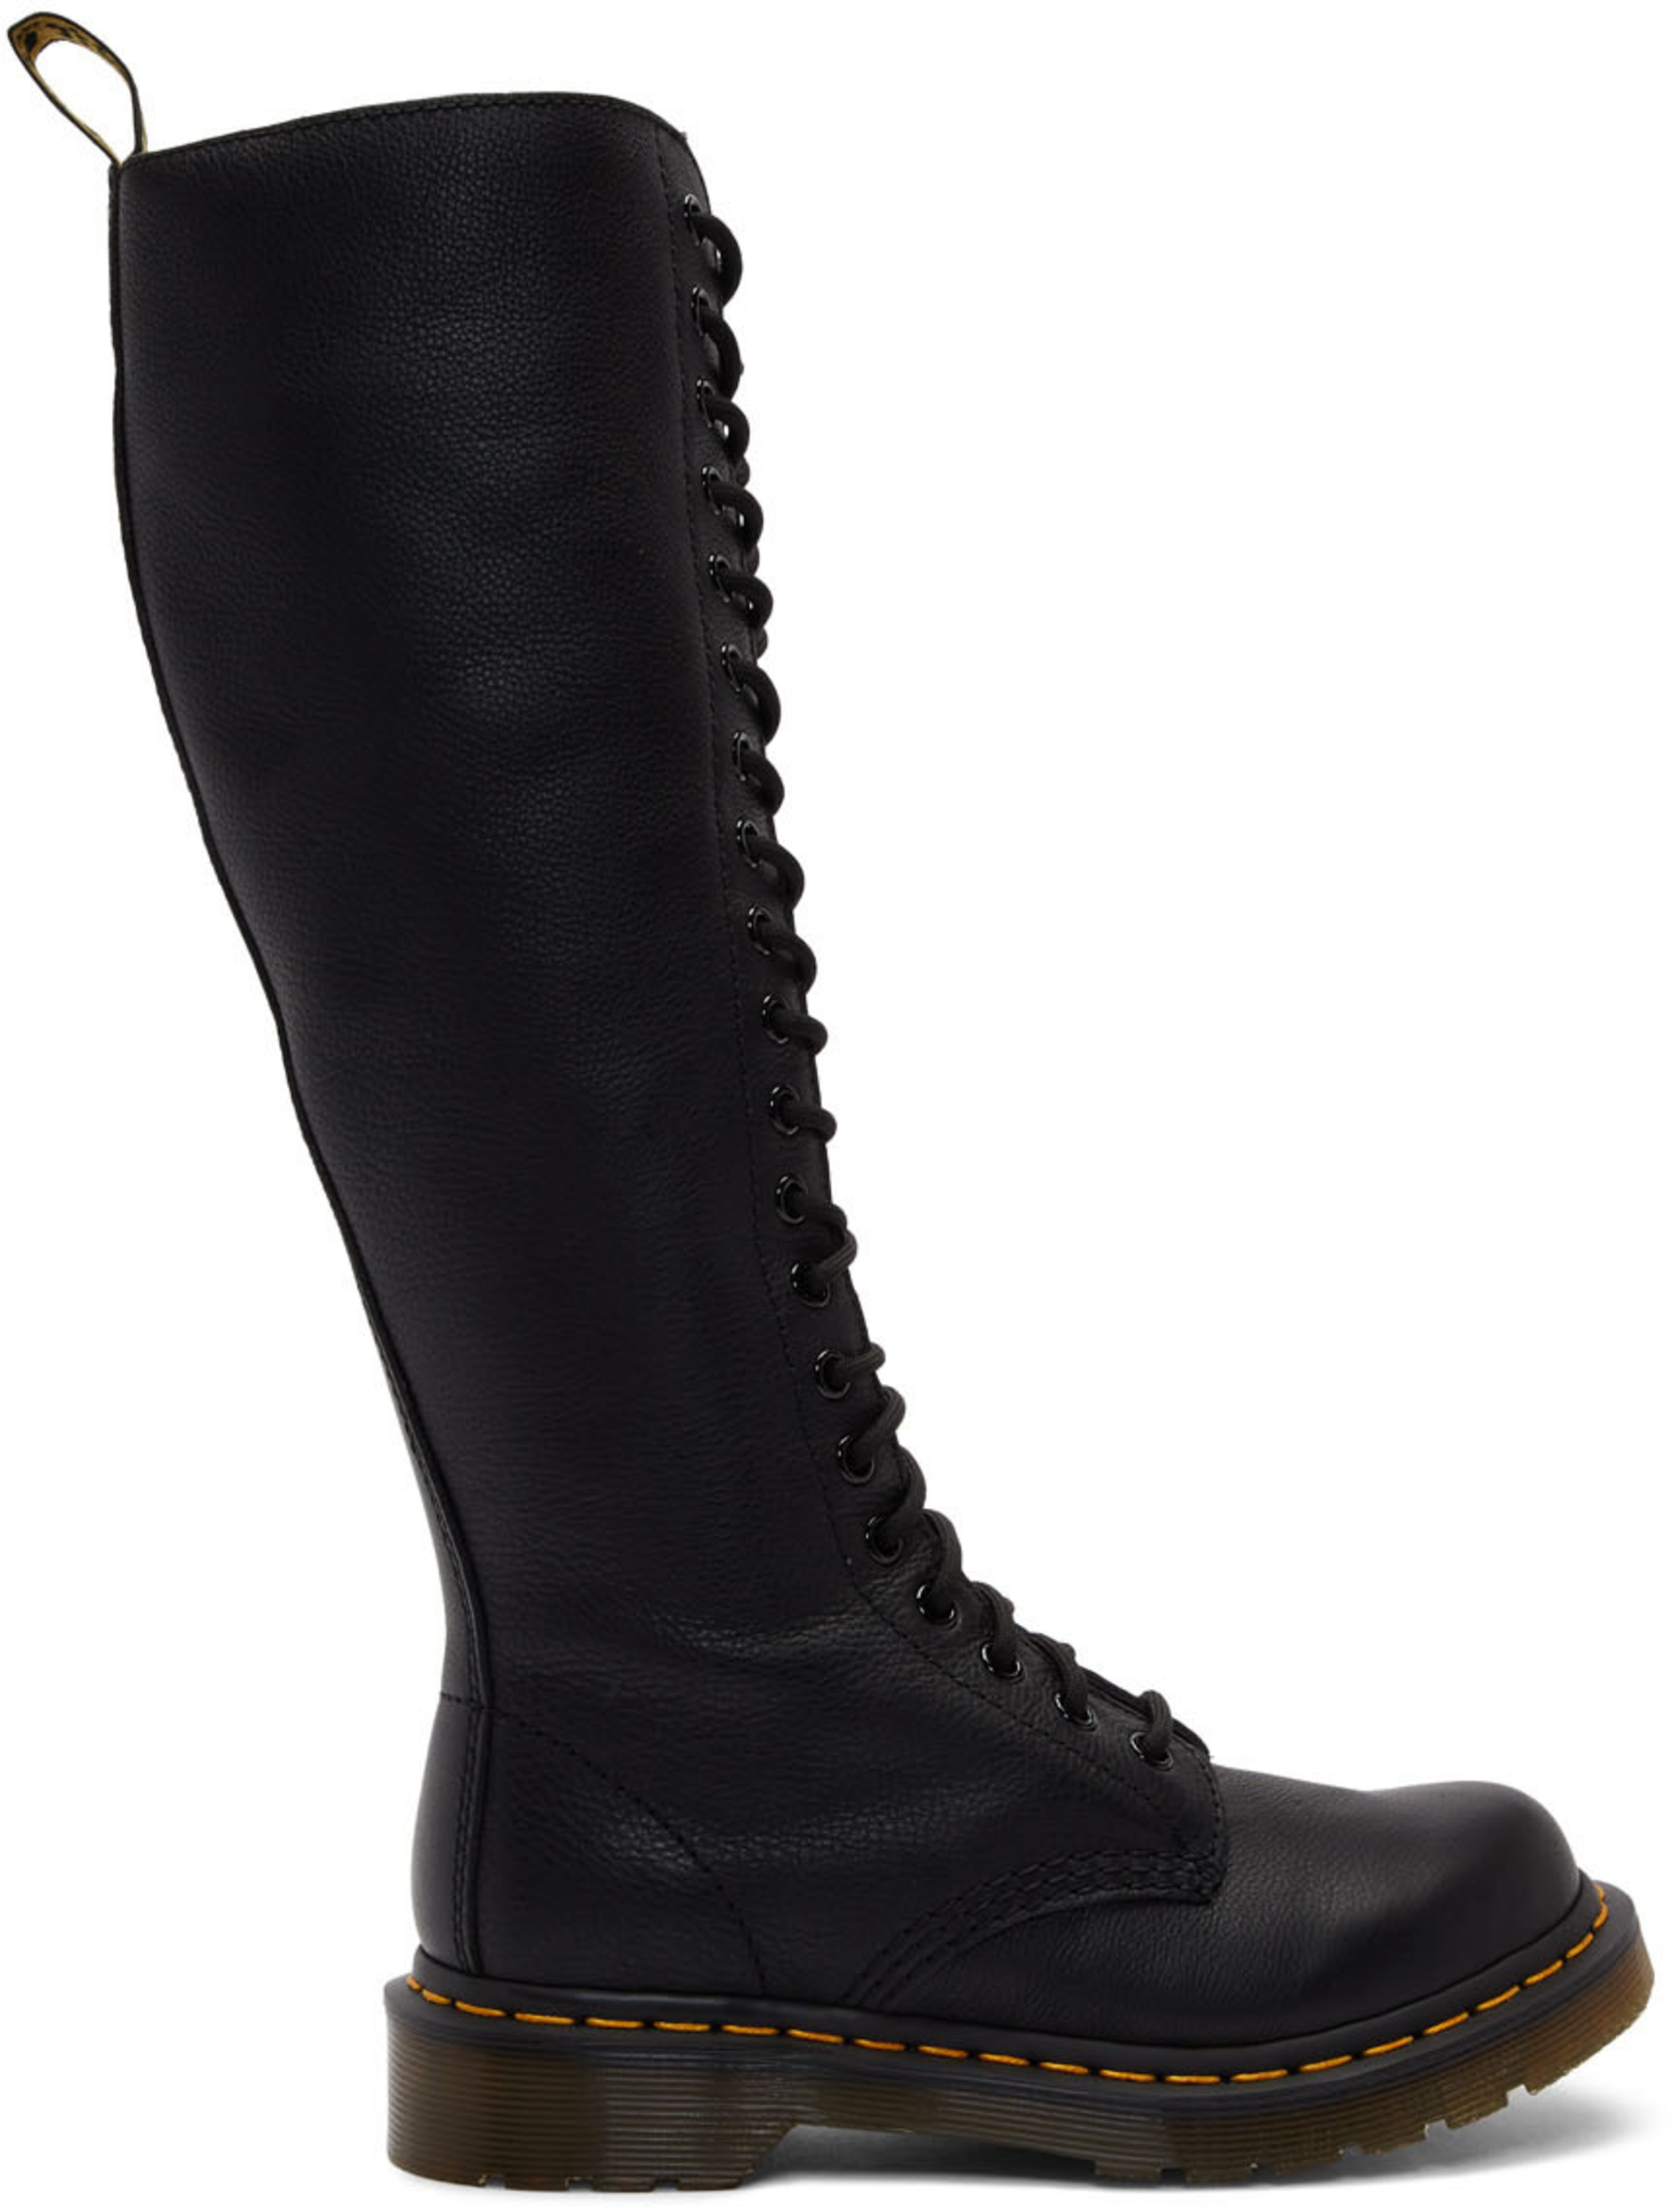 SnowplowDr Cuir 2976 2976 Boots Cuir Boots Martens SnowplowDr uTFc3lKJ1